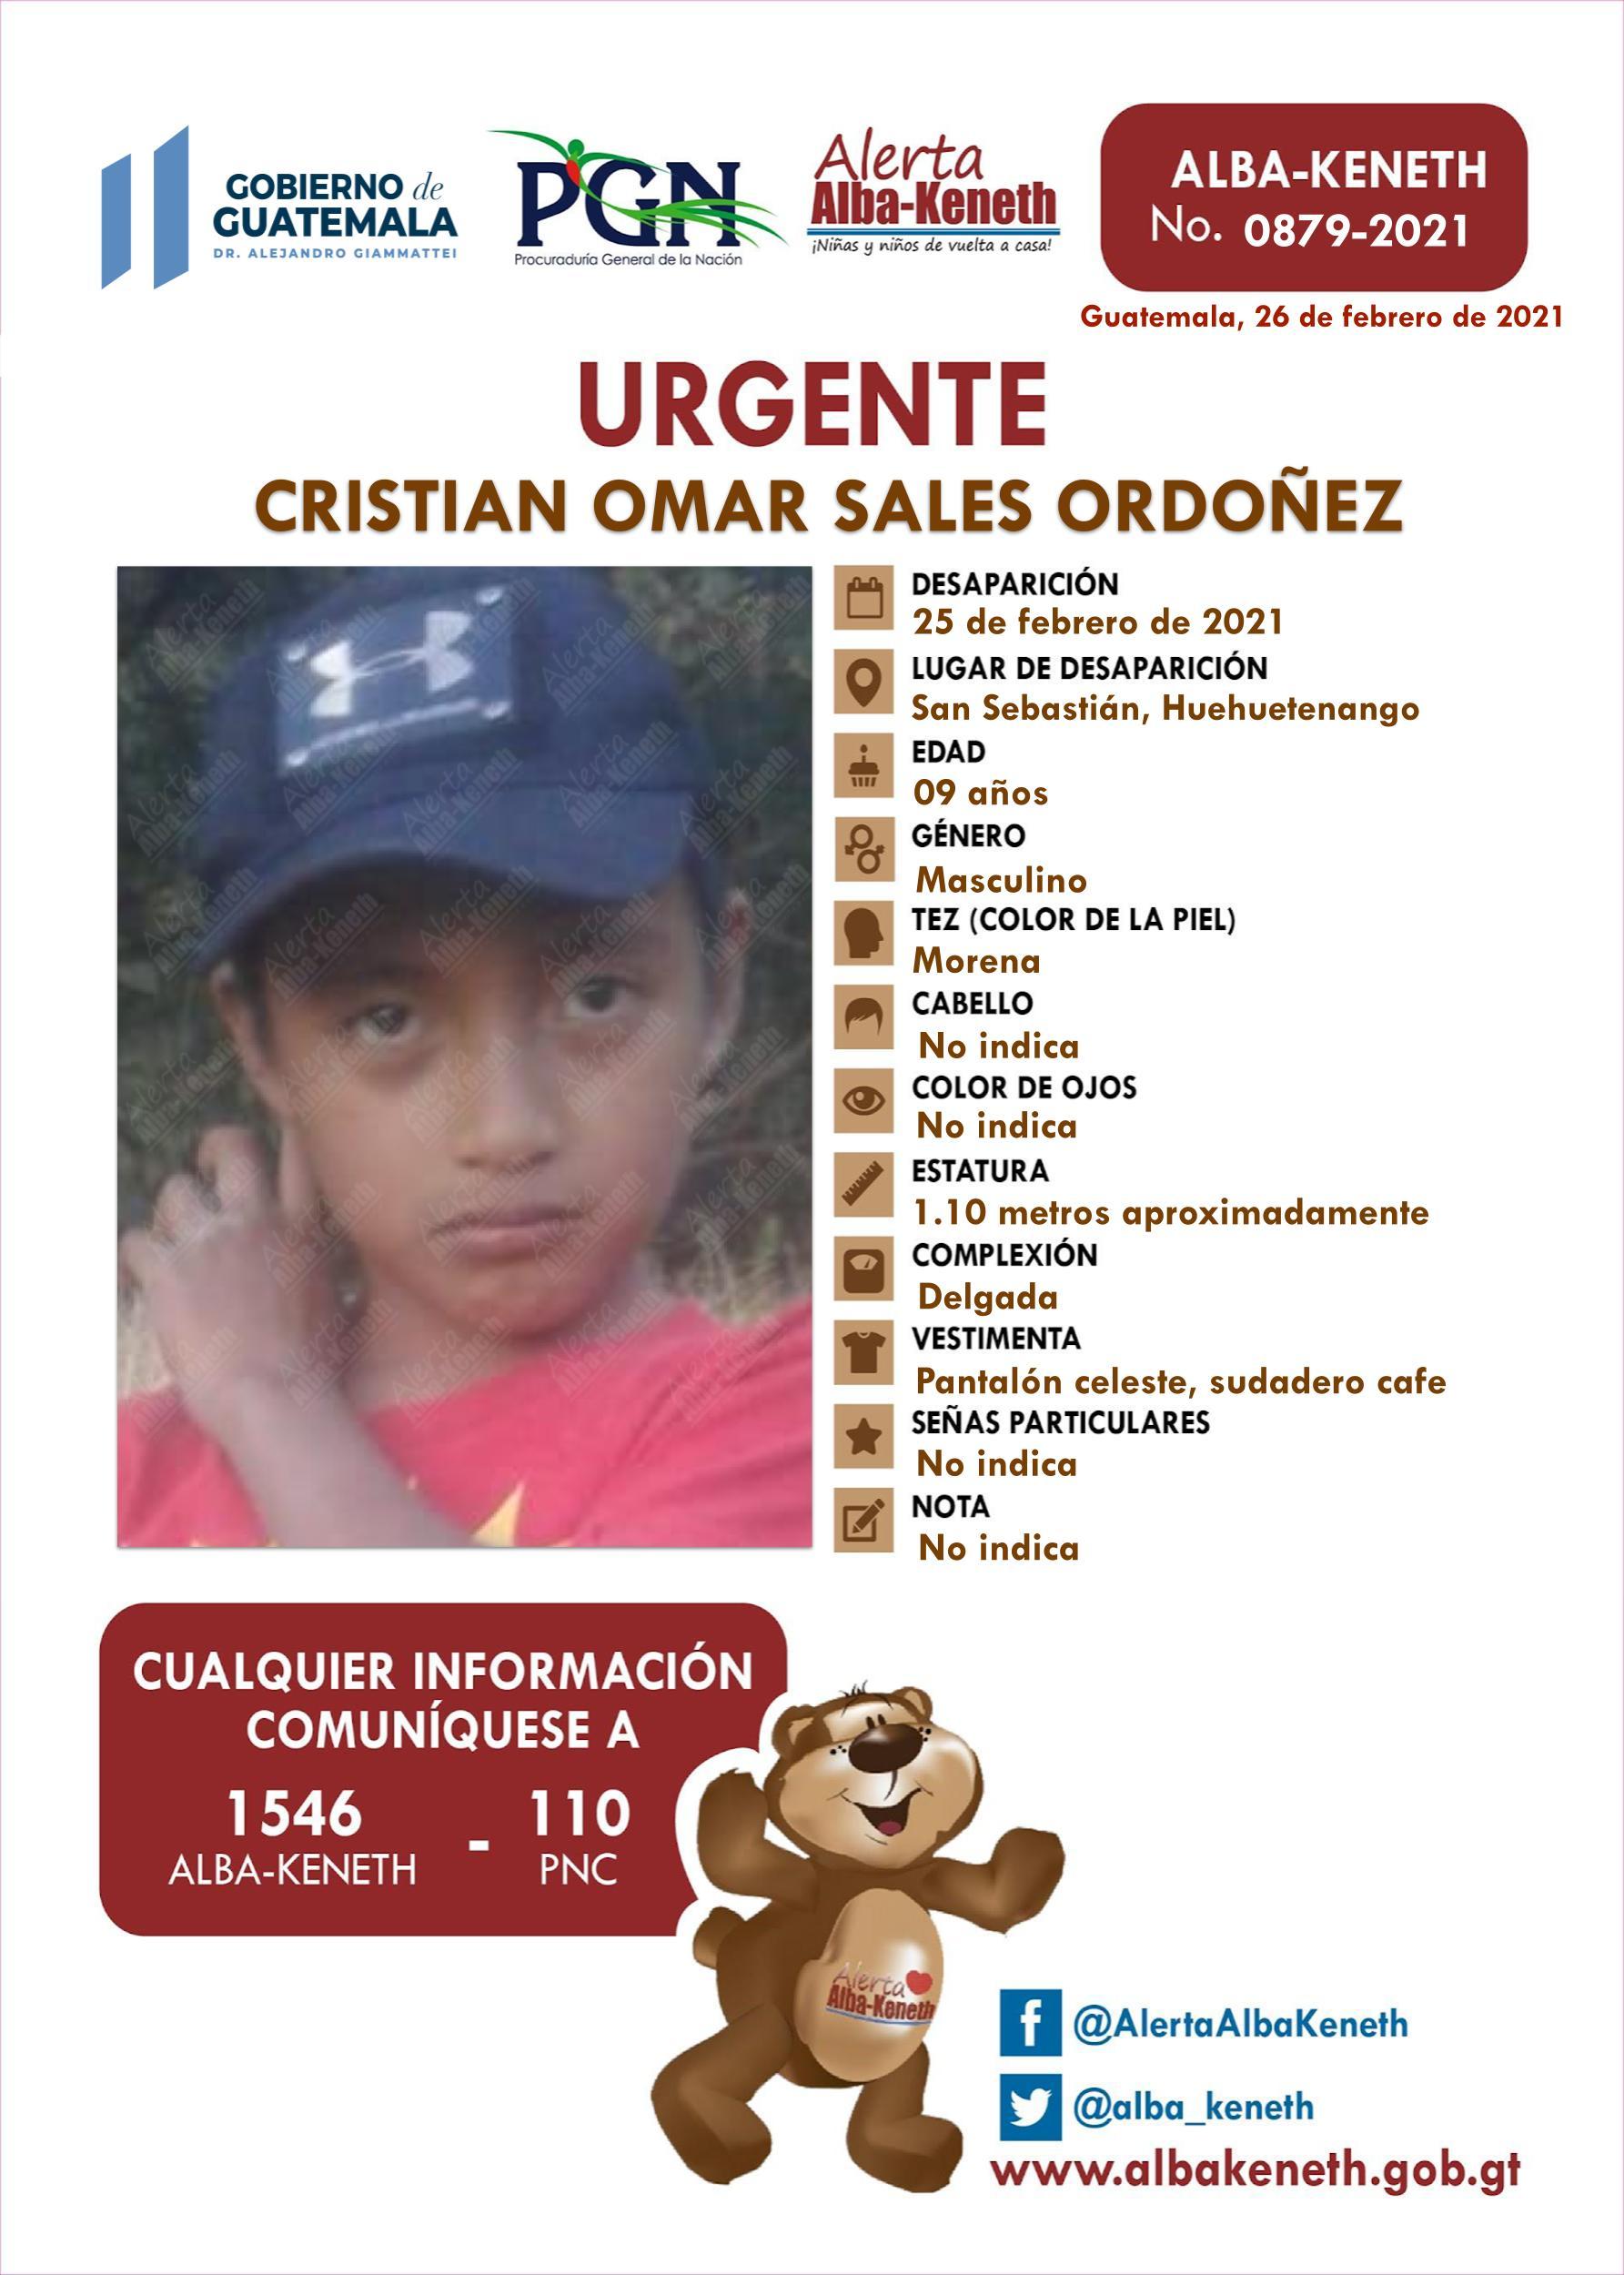 Cristian Omar Sales Ordoñez